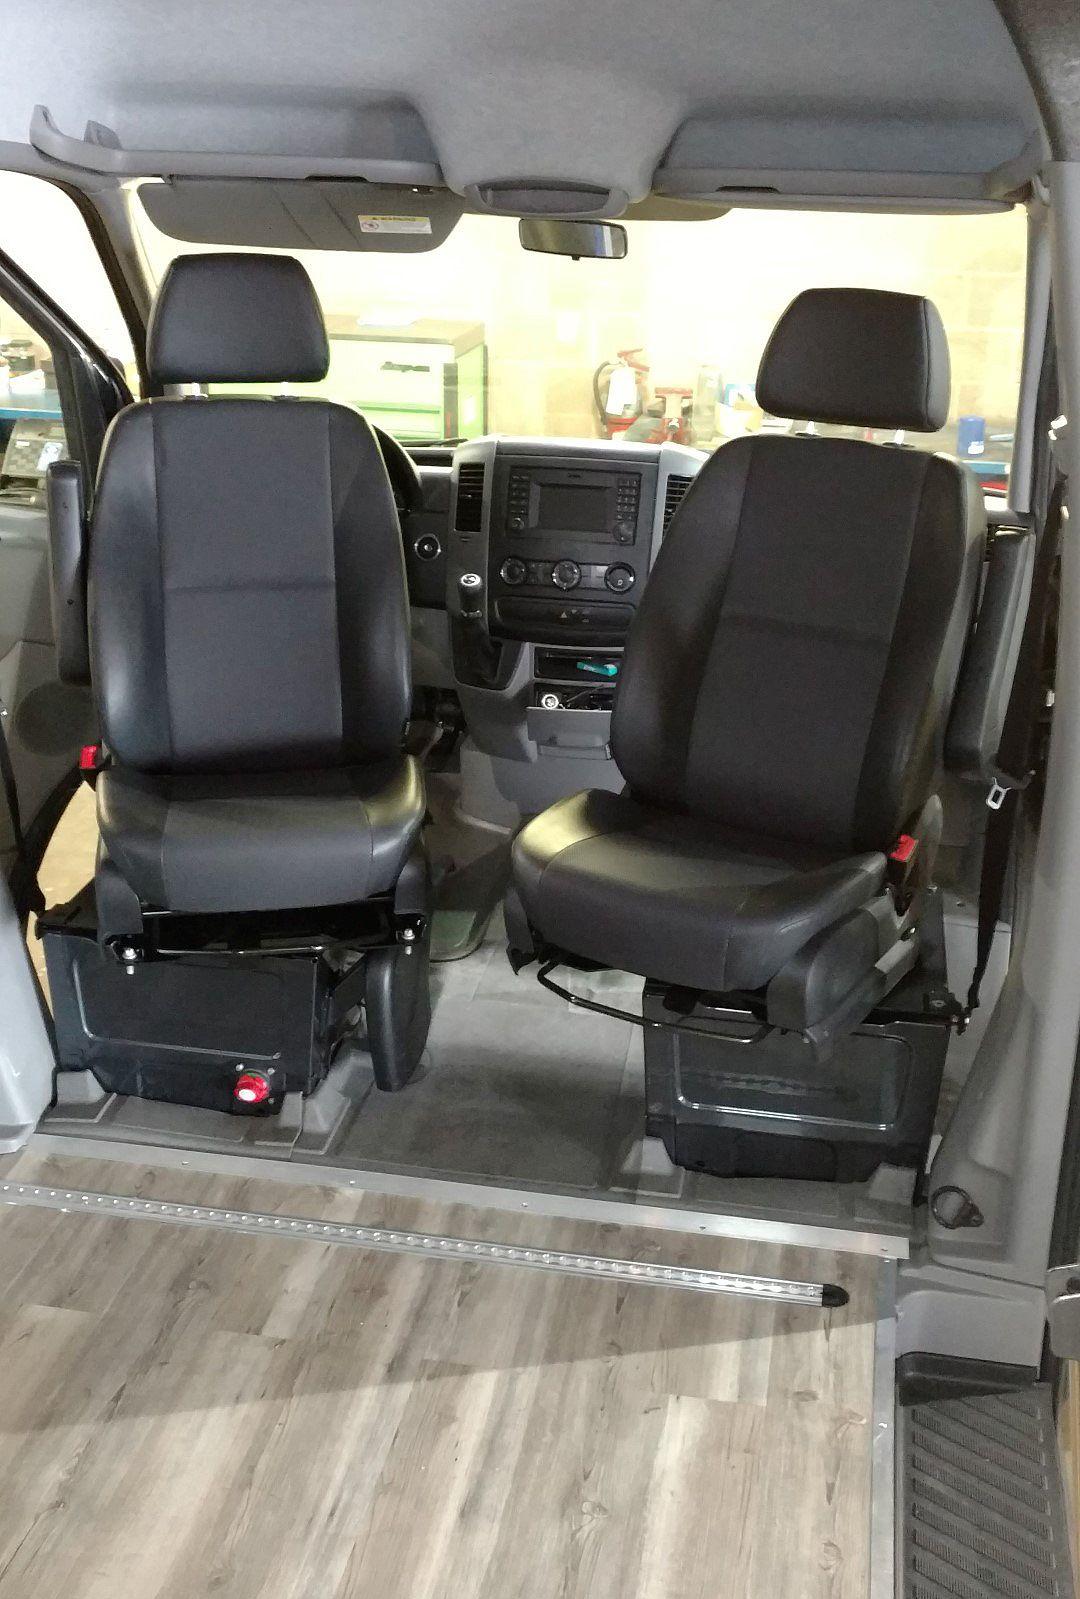 Sprinter Van Sportcraft Swivel Seats Installation Sprinter Van Tailgating Van Vans